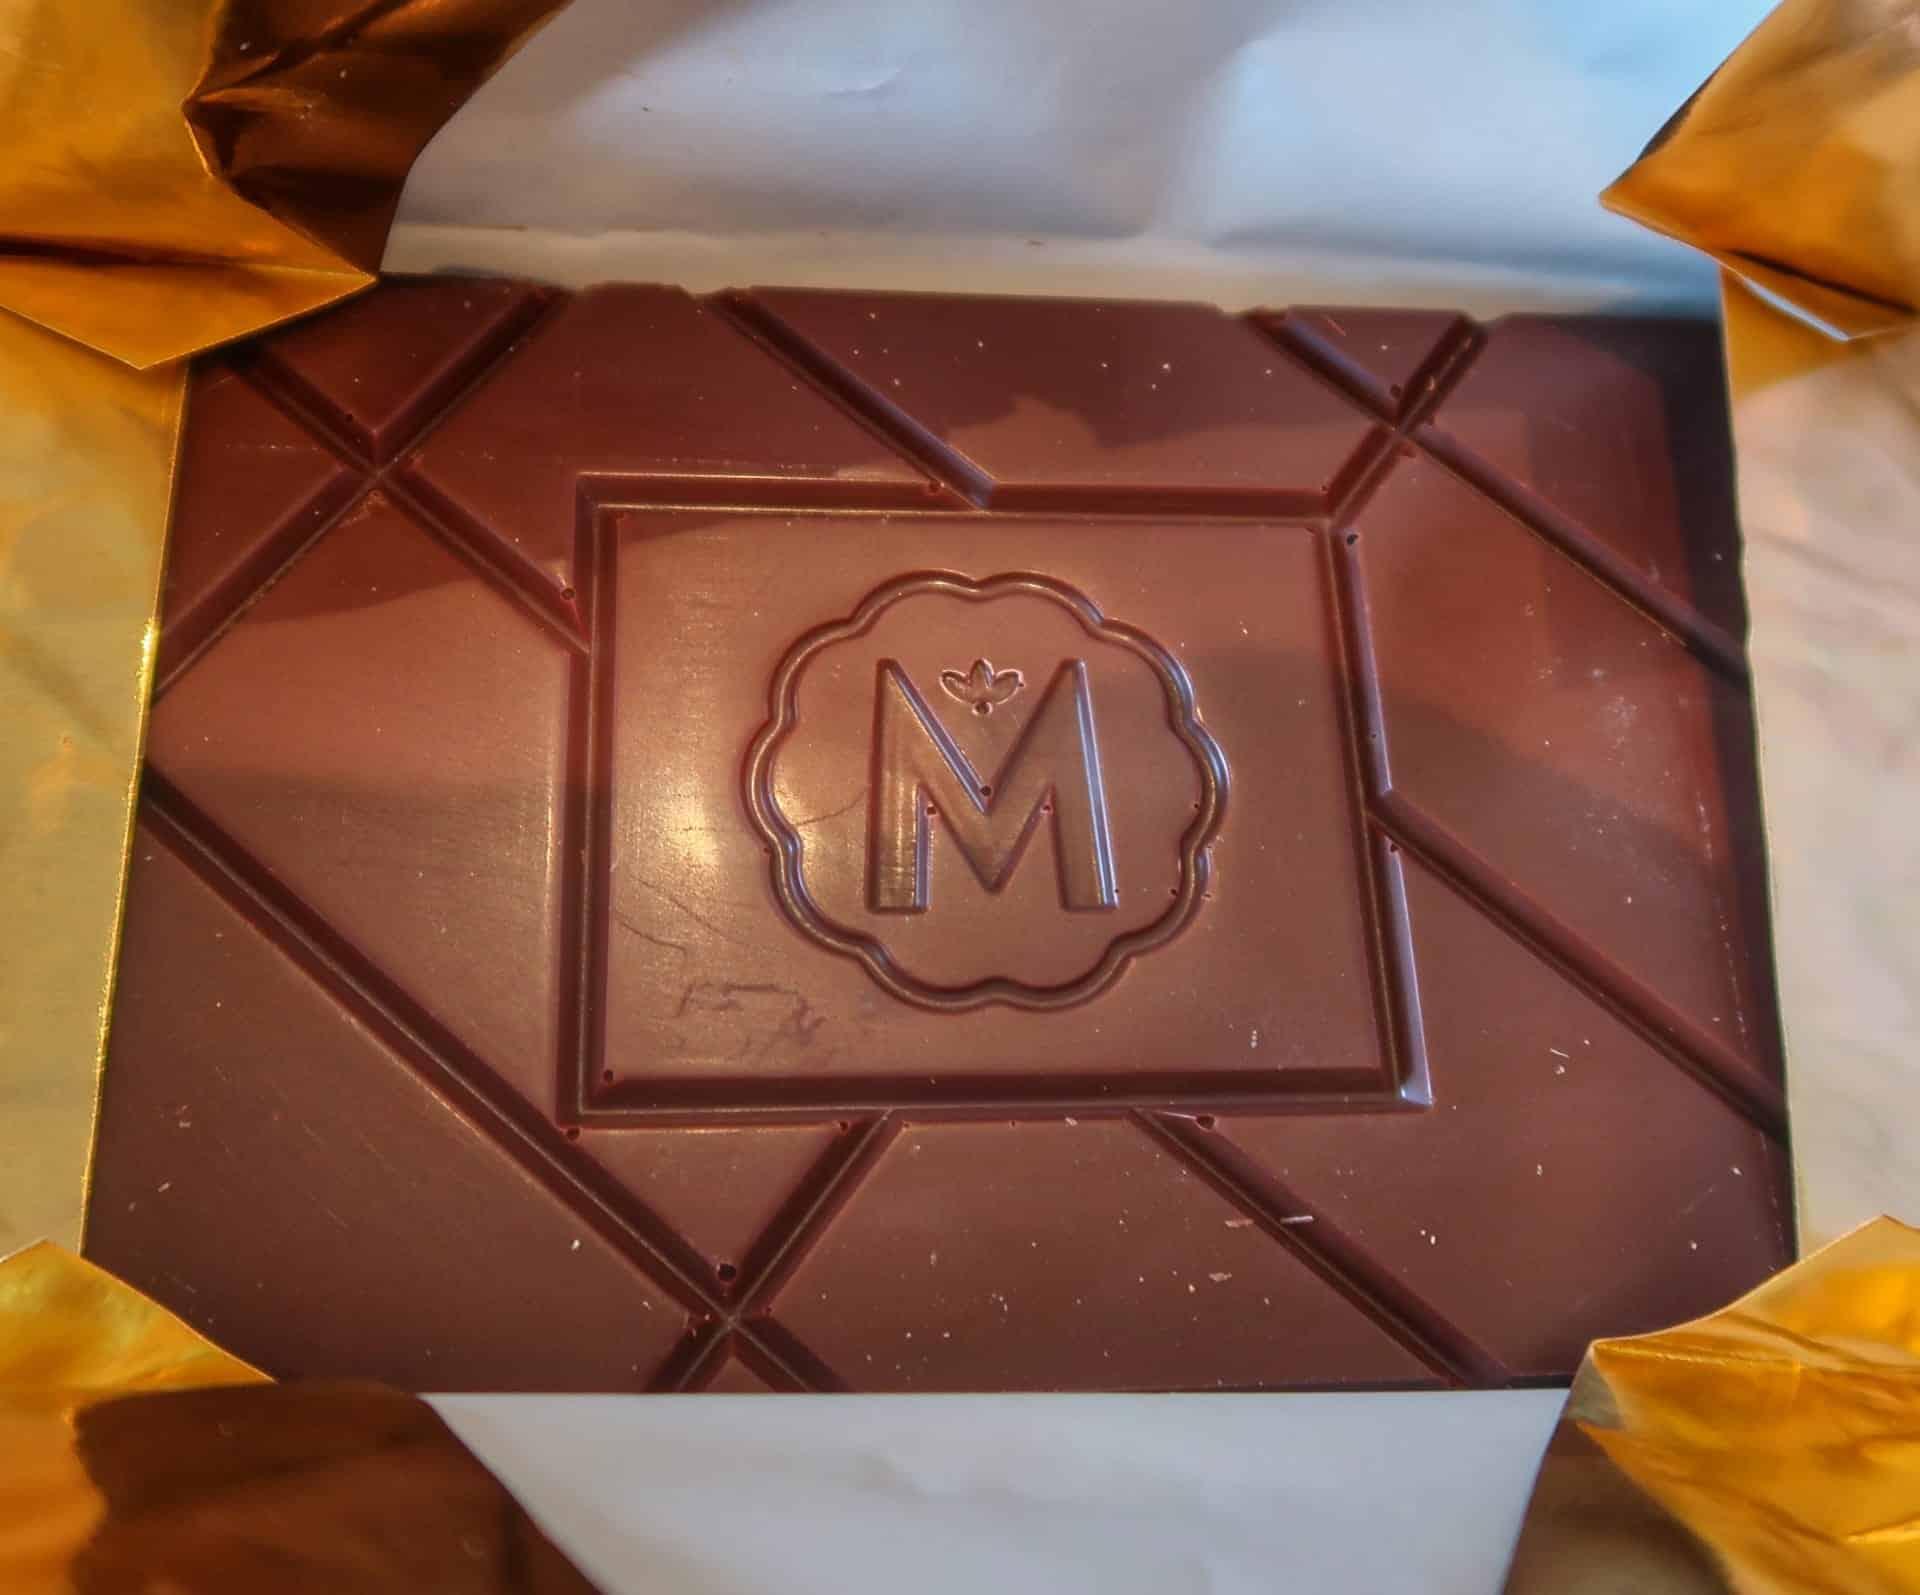 Maison Marou mælkechokolade